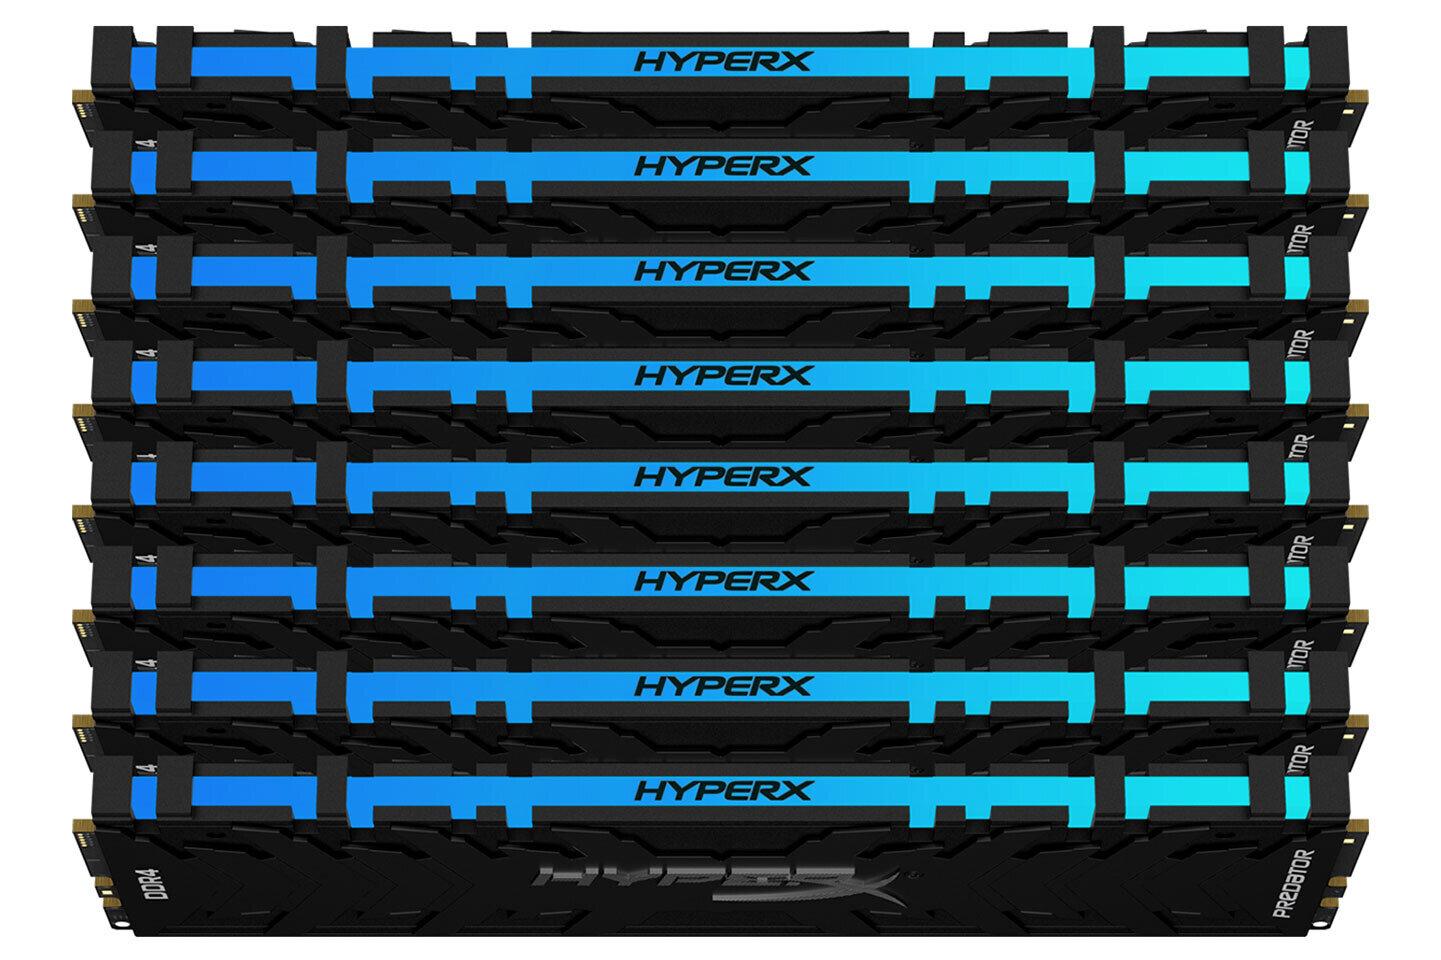 HyperX Predator RGB (2020)